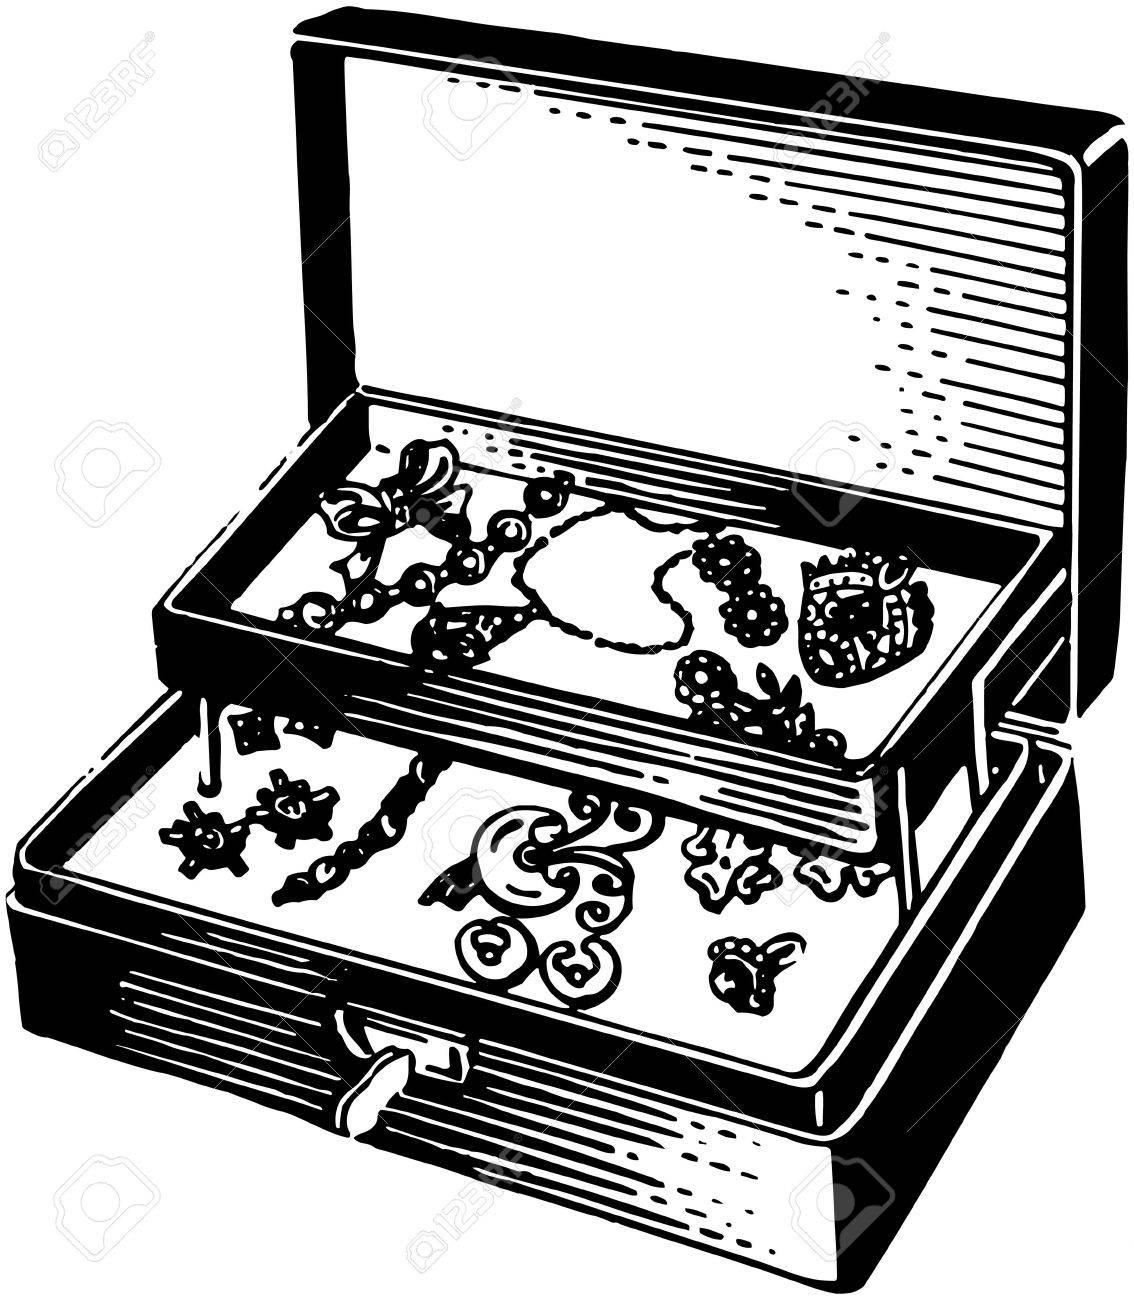 Silver Jewelry Box.